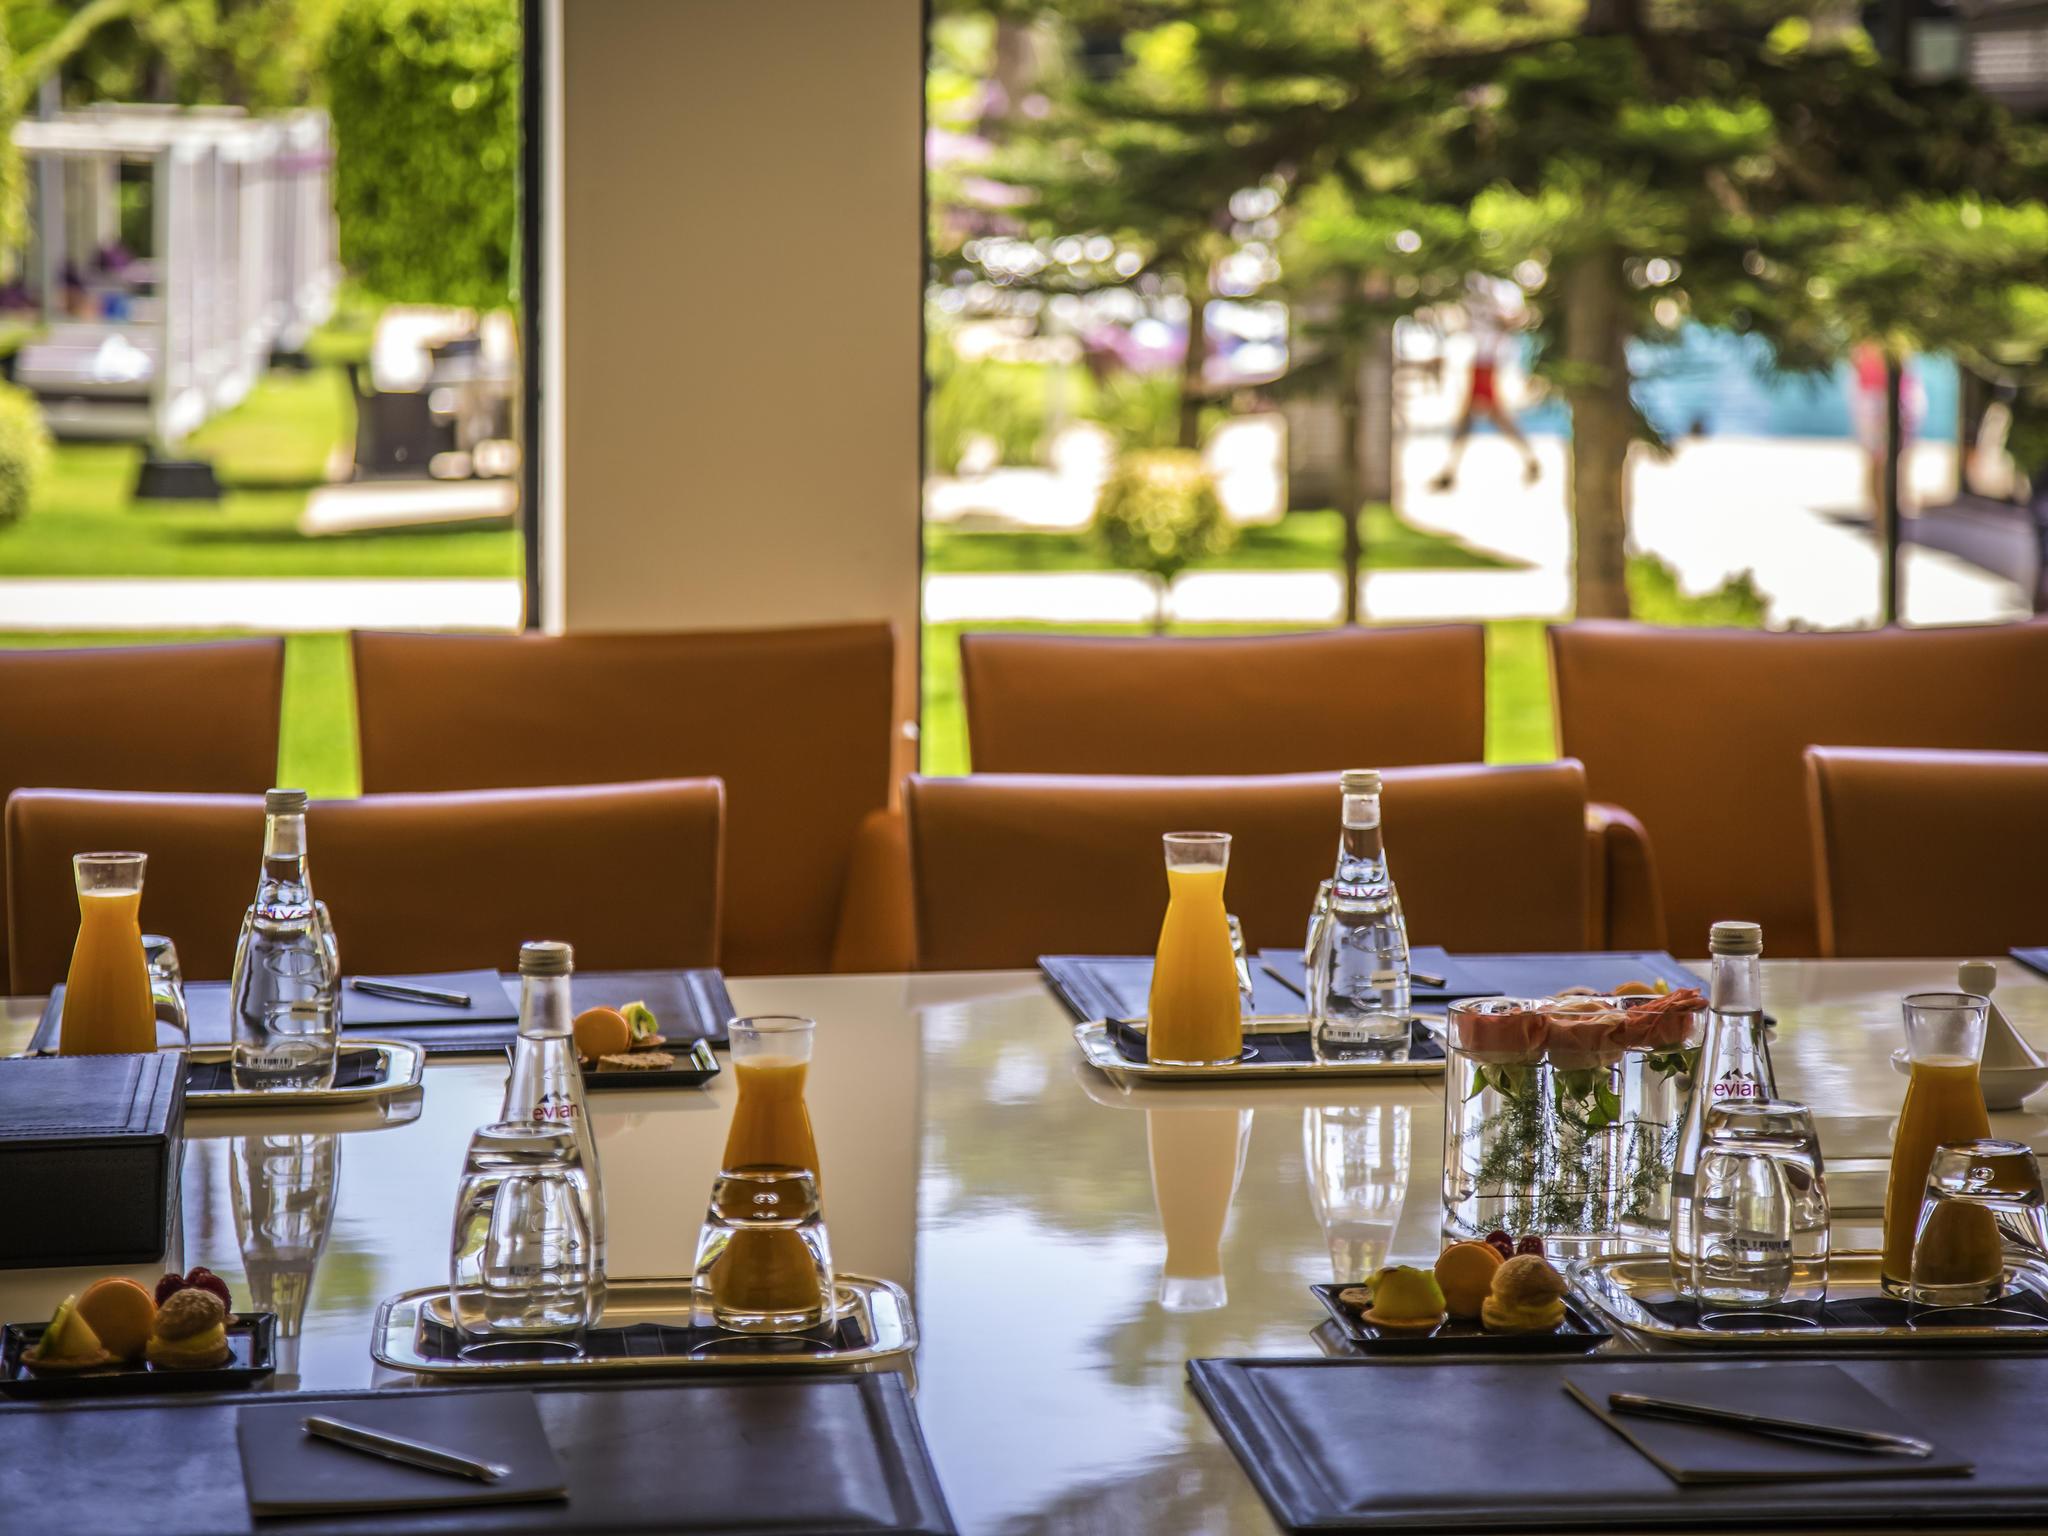 Hotel In Rabat - Sofitel Rabat Jardin Des Roses - All dedans Salon De Jardin D Occasion